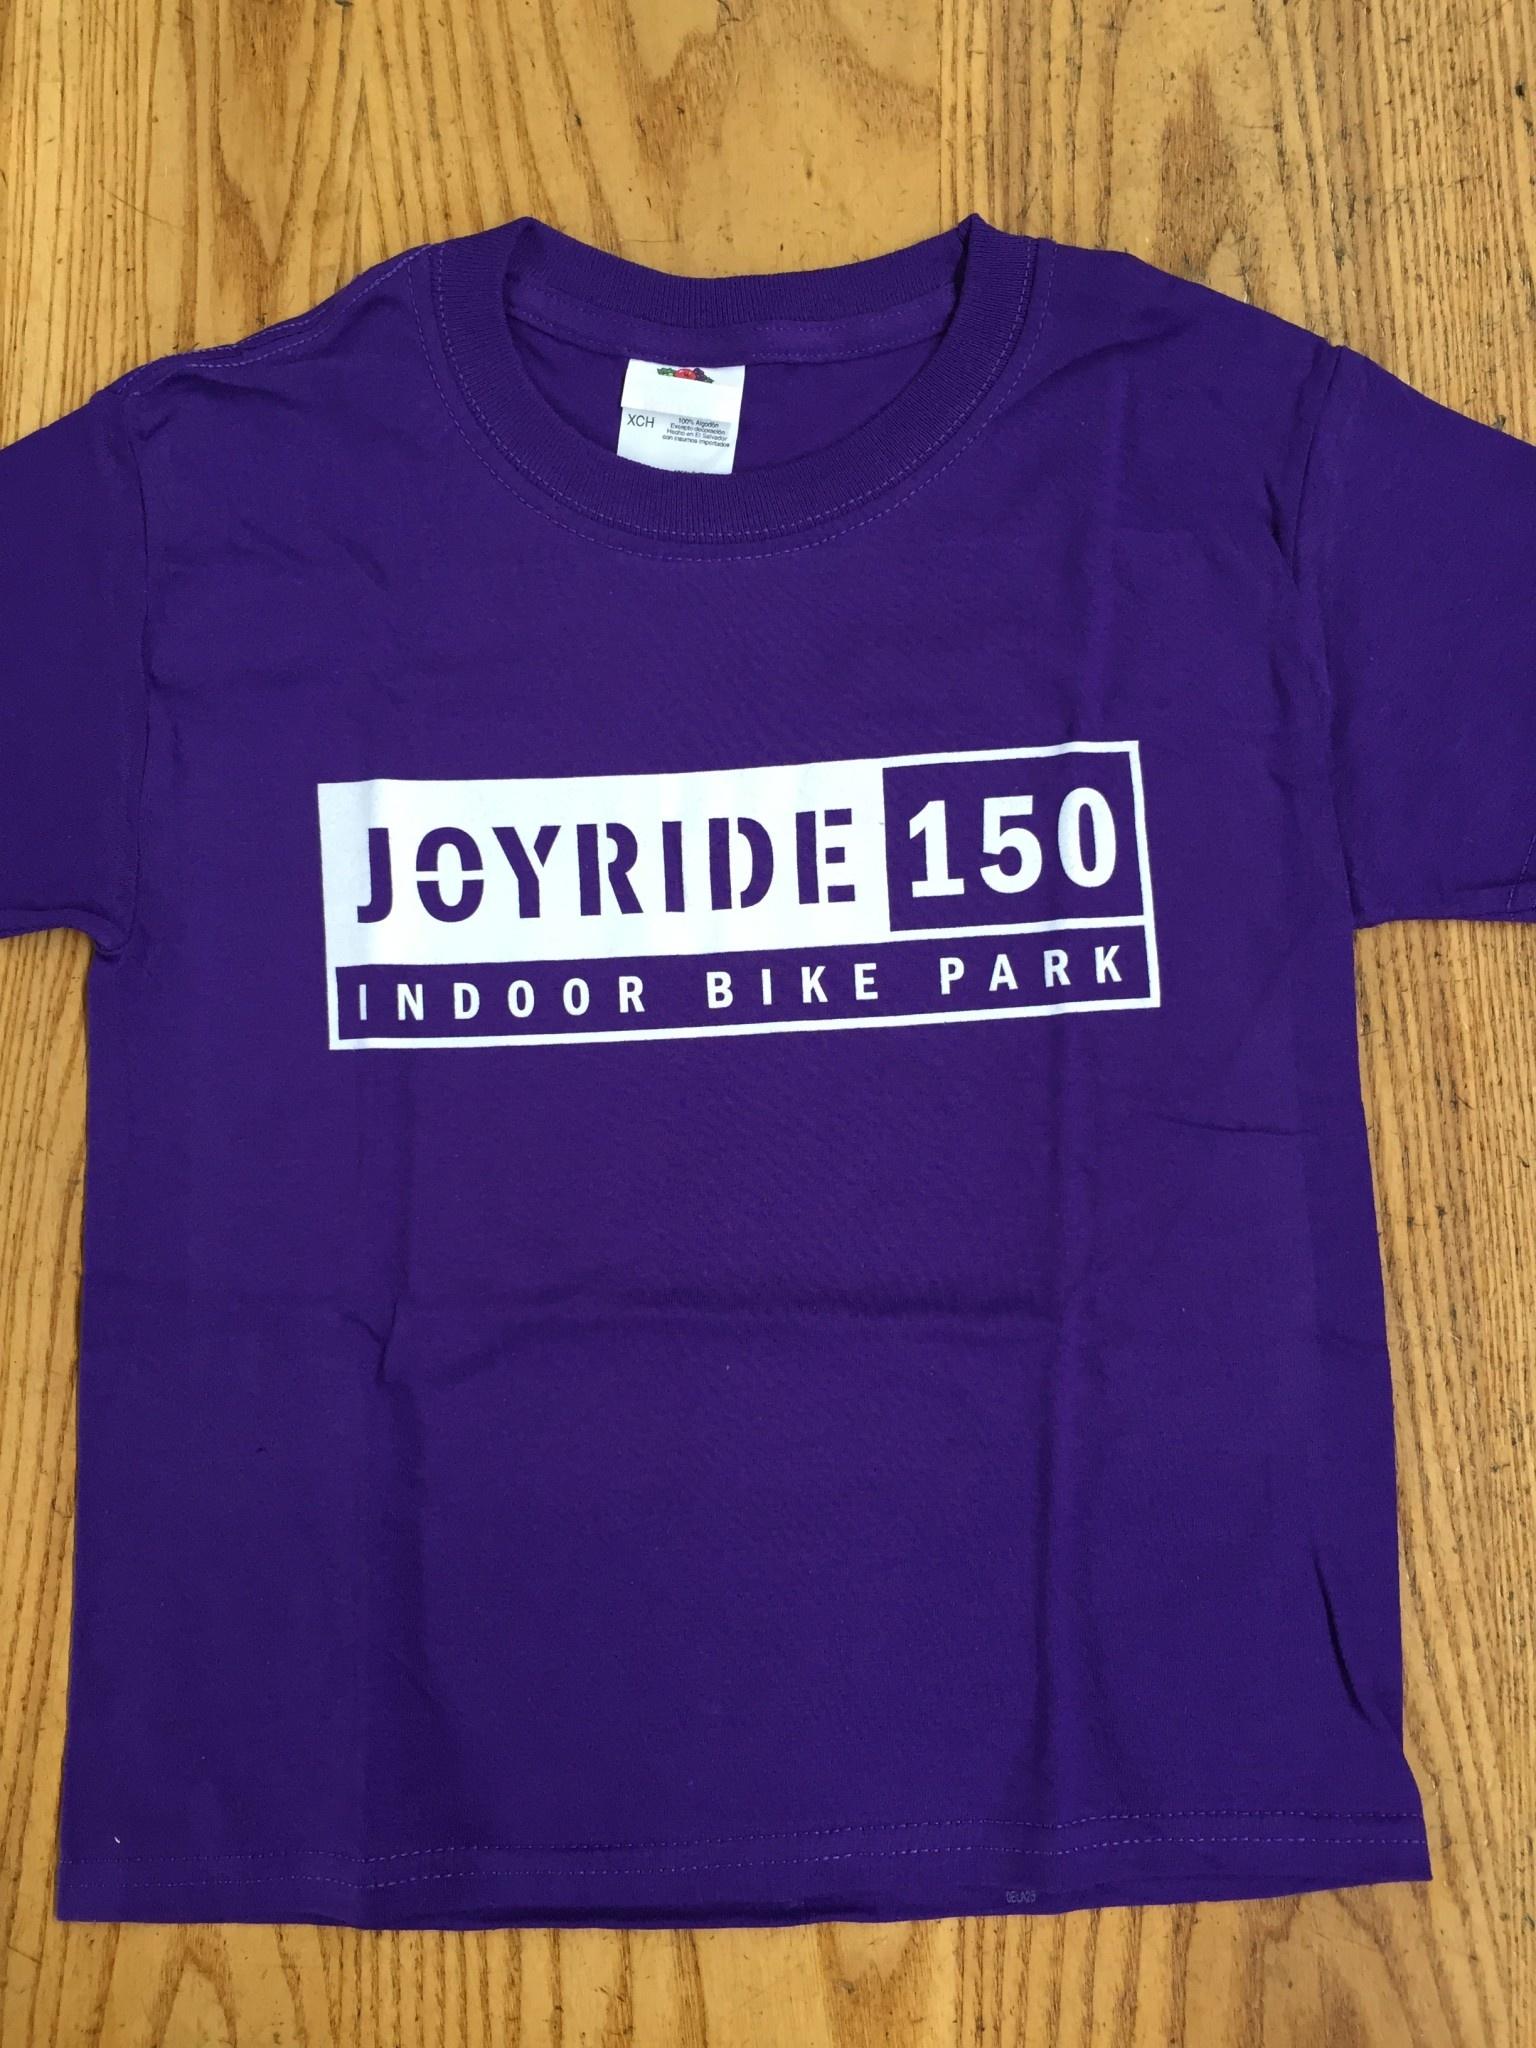 Joyride 150 Classic Tee